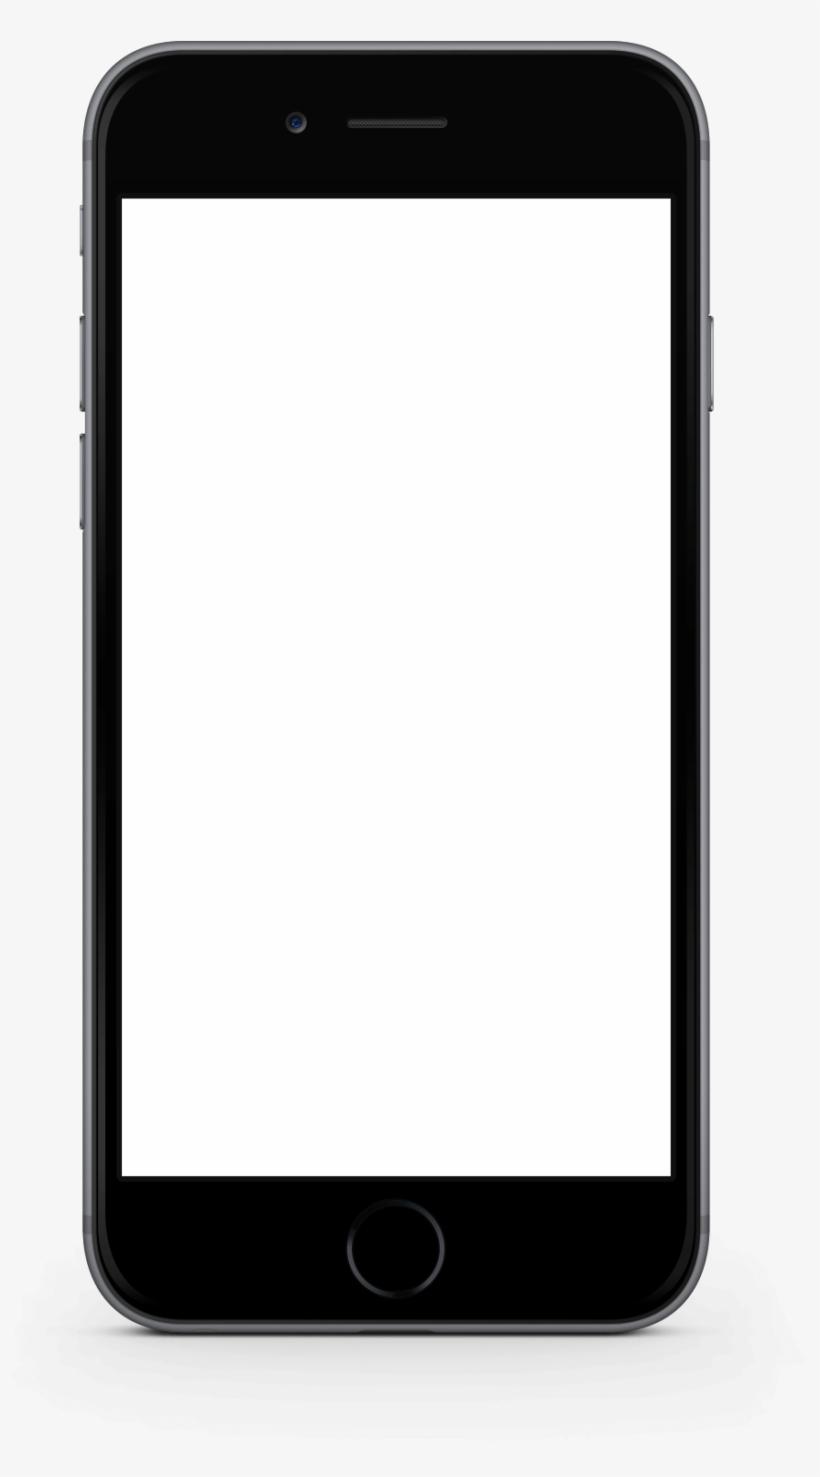 Iphone Frame.